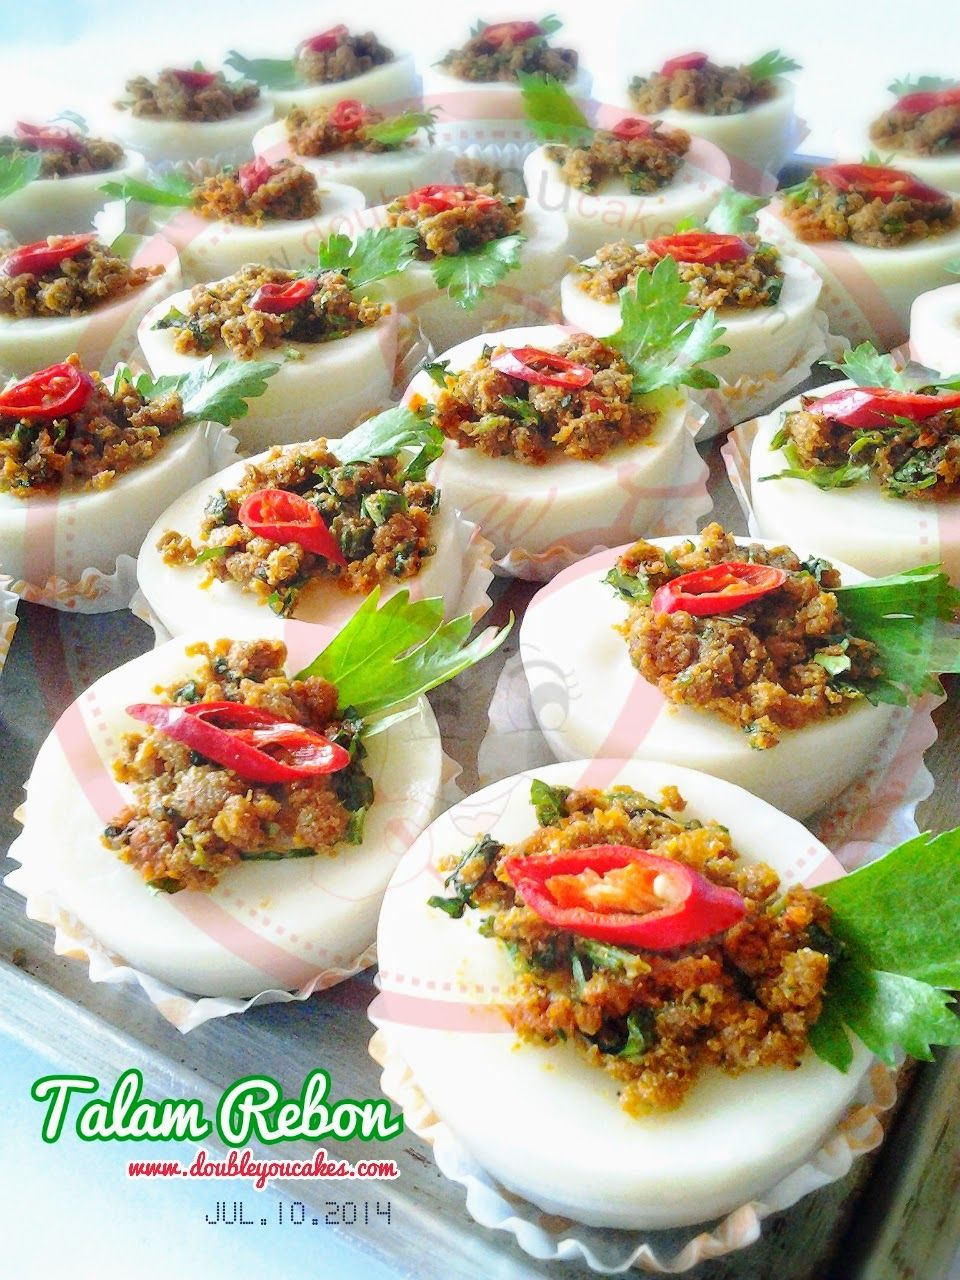 Dapur Nyonya Talam Rebon Makanan Dan Minuman Masakan Resep Masakan Indonesia